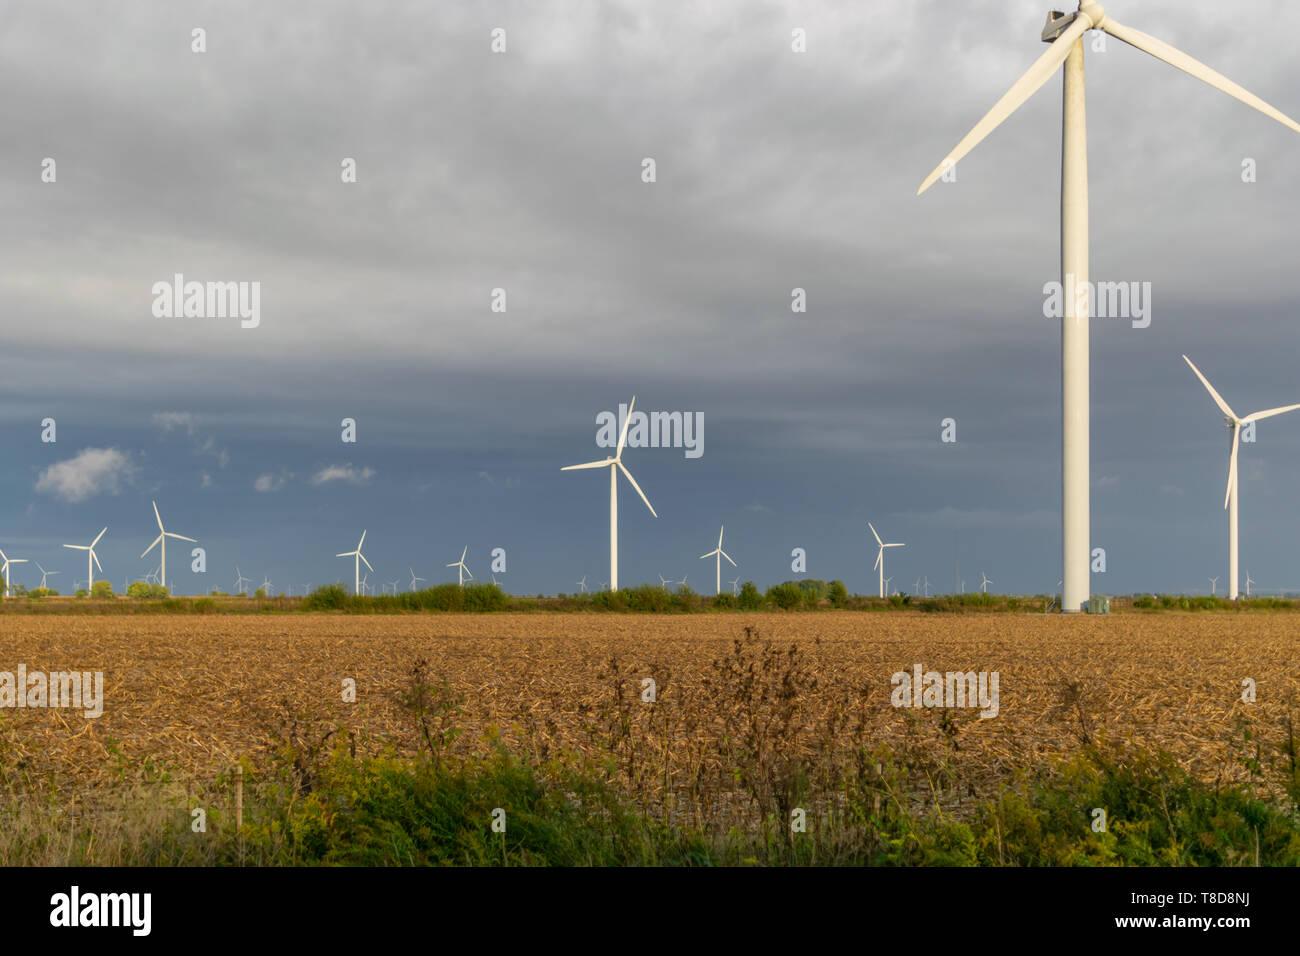 Close up of Wind Turbine farm in an open field. - Stock Image